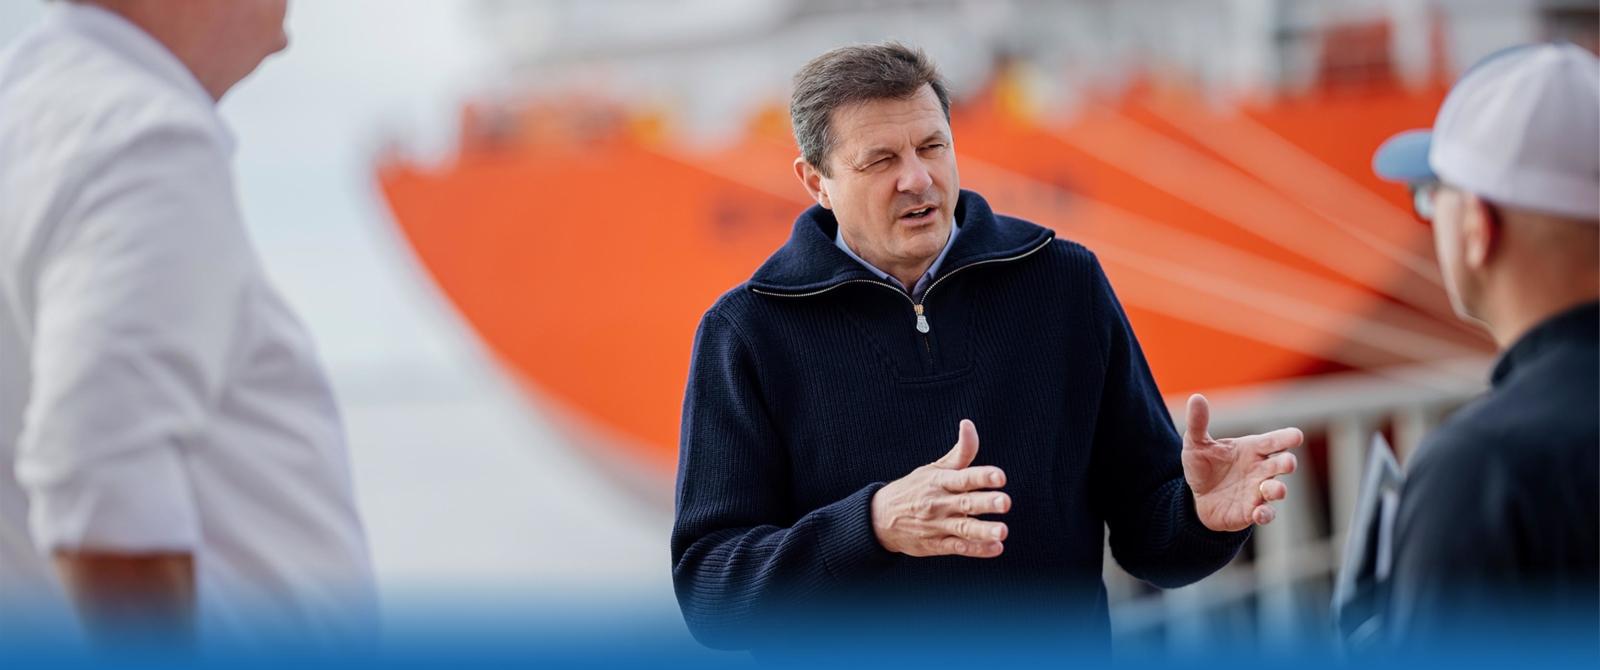 slider-oliver-grundmann-2021-bundestagswahlen-stade-rotenburg-bremervoerde (54)